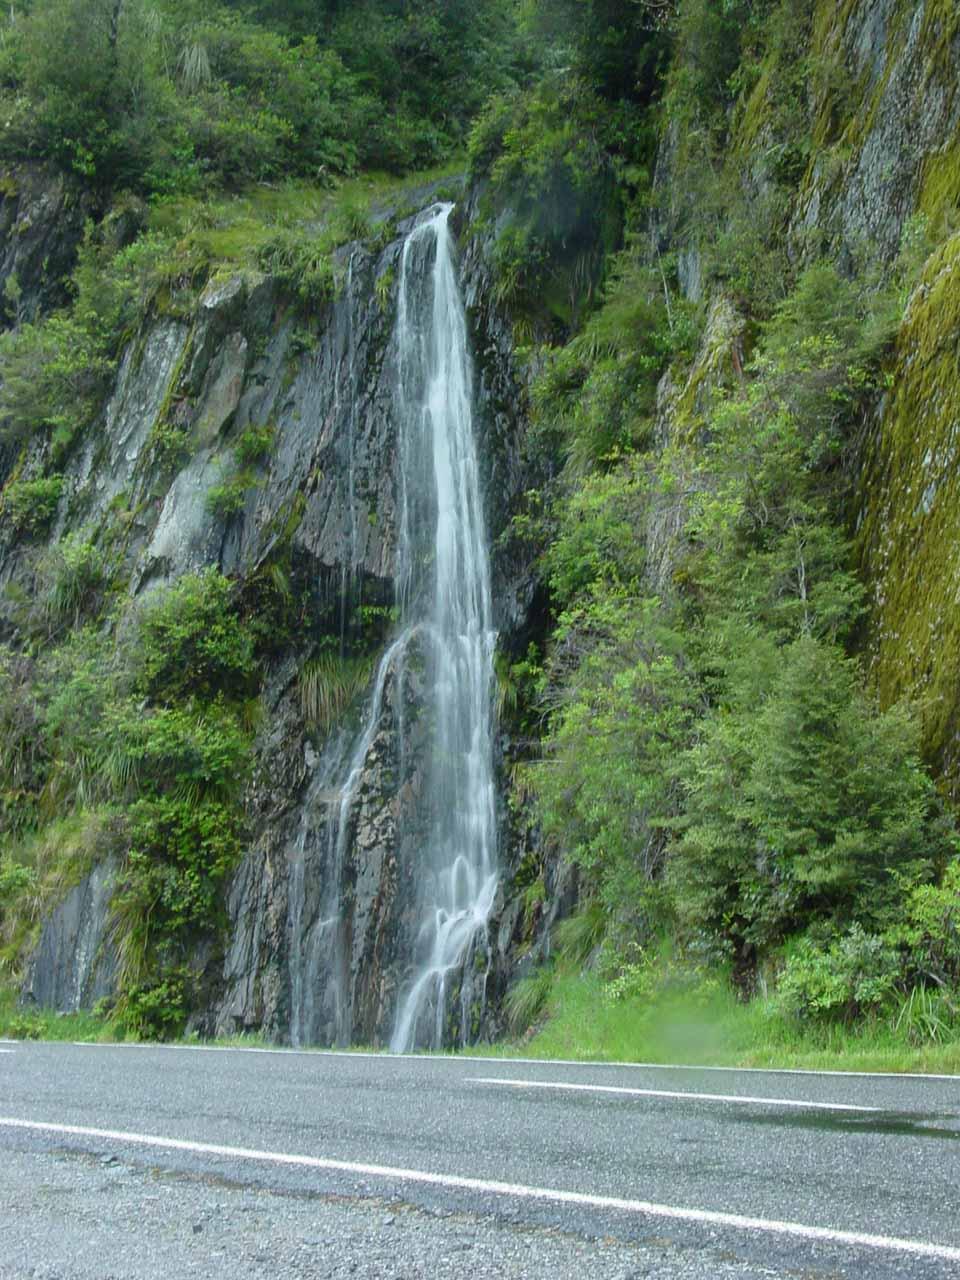 A roadside waterfall in Mt Aspiring National Park